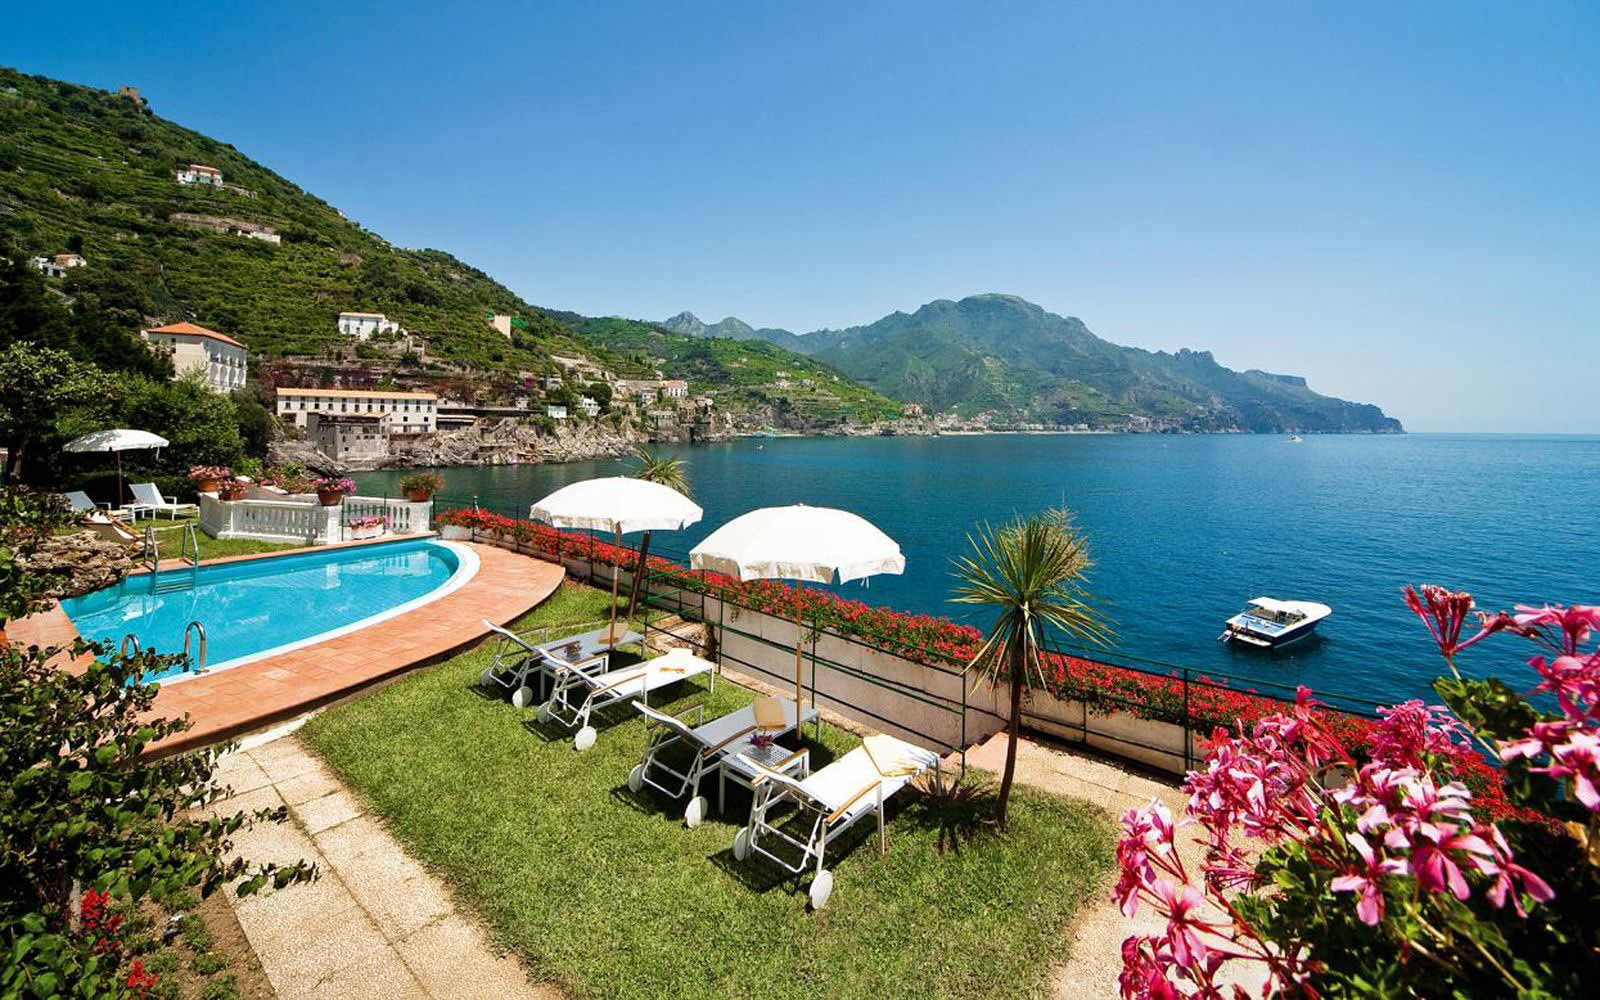 Club House Swimming Pool at Palazzo Avino